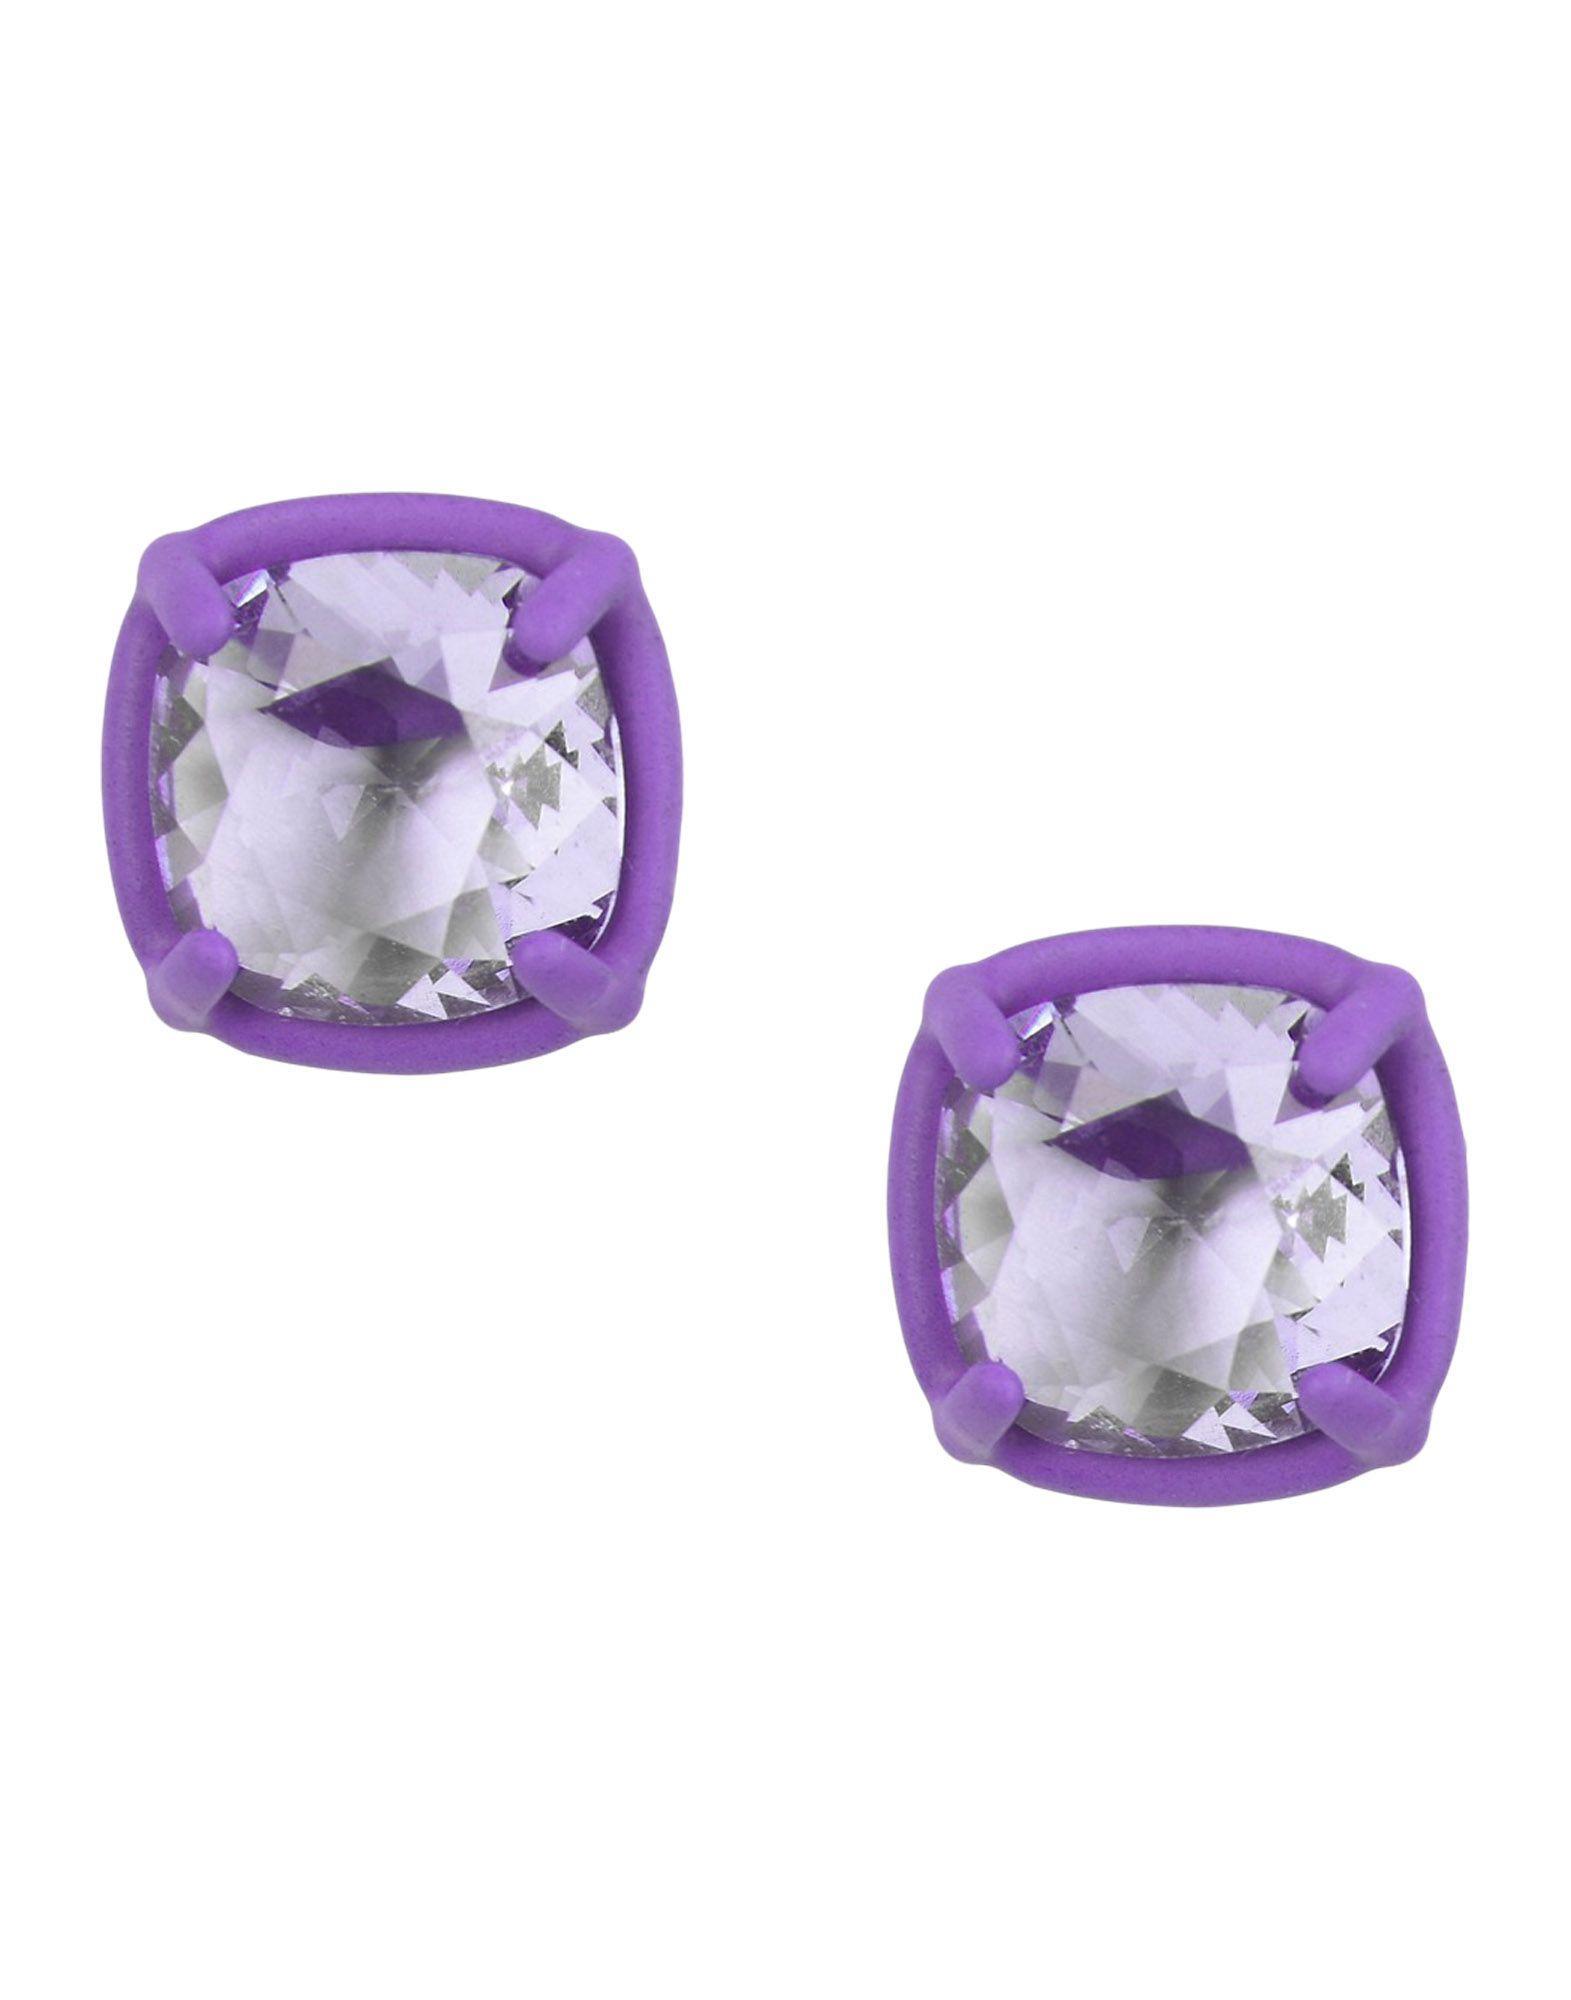 Atelier Swarovski By Rosie Assoulin In Purple